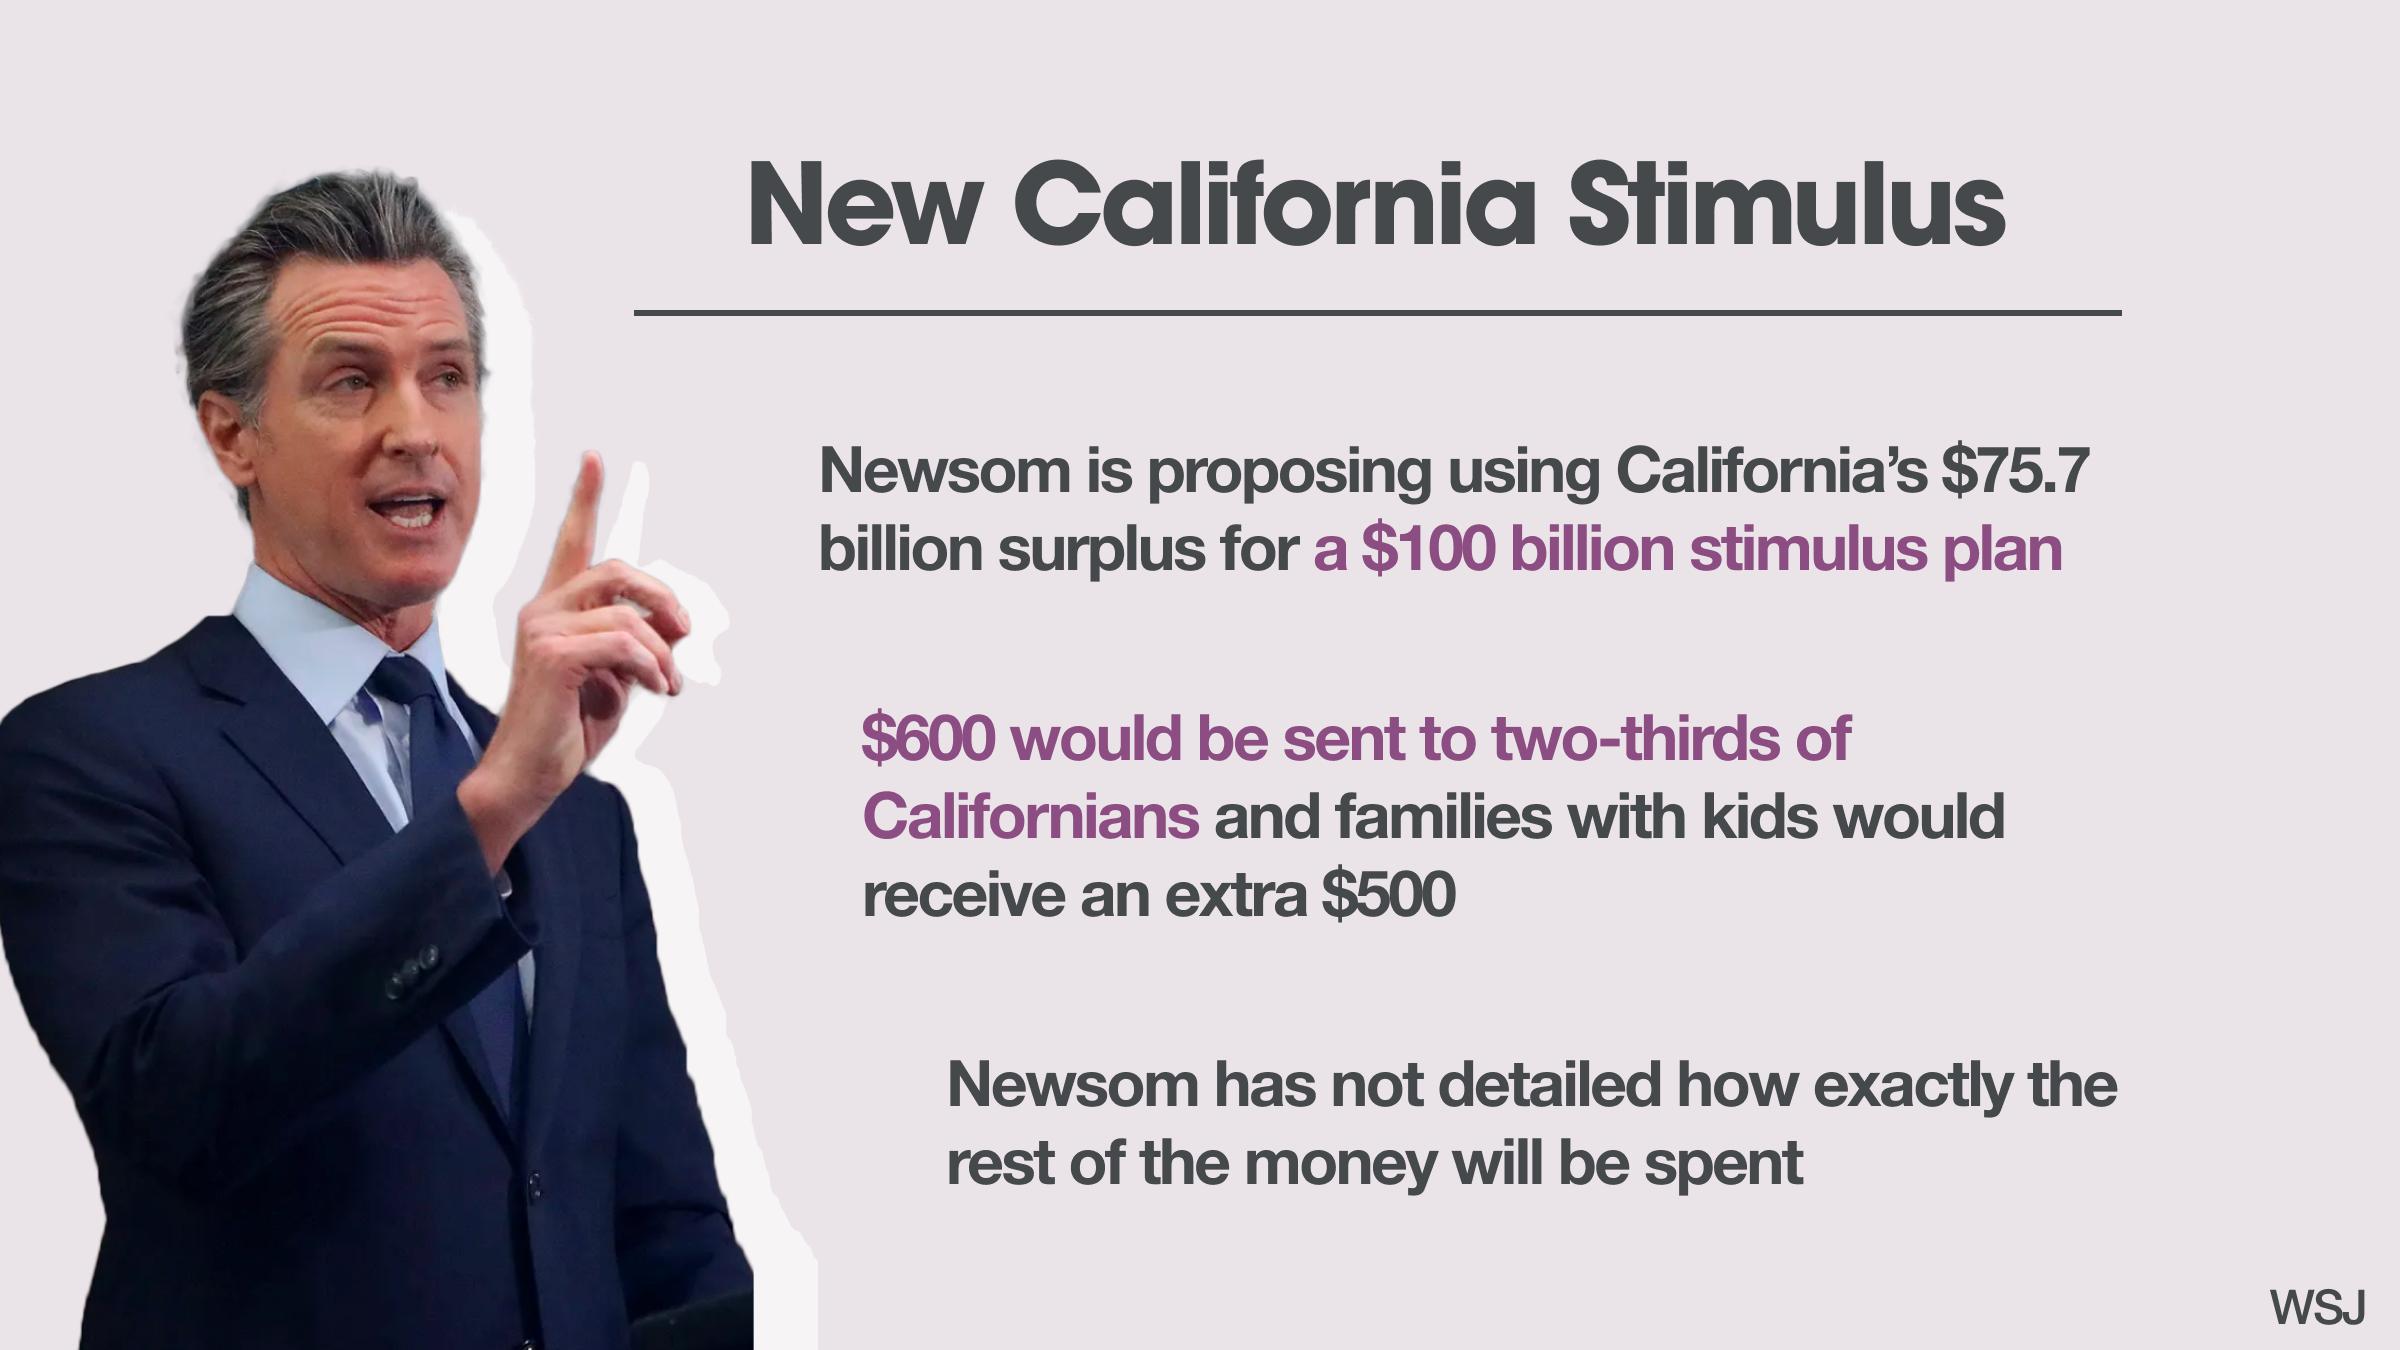 New $100 Billion California Stimulus